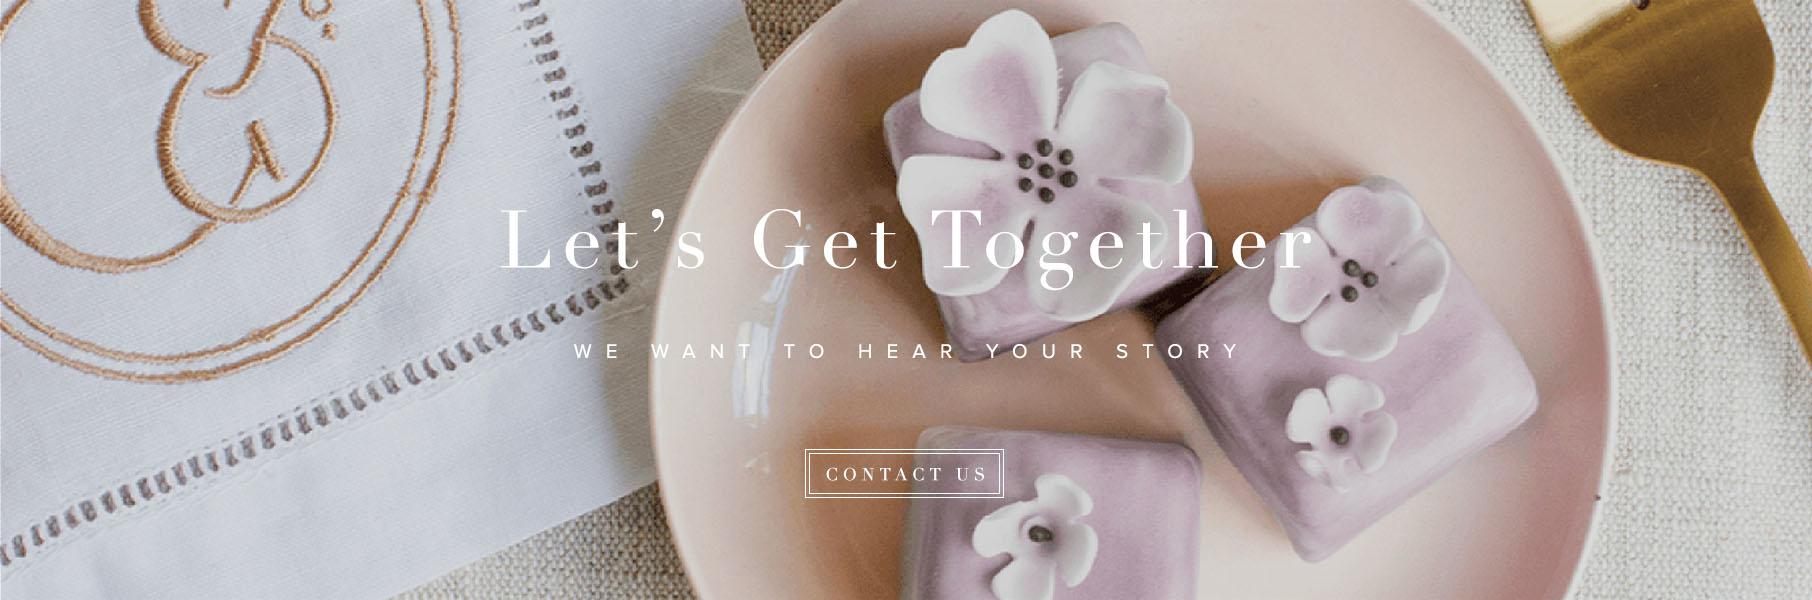 LA wedding and event planning by Cassandra Santor & Company